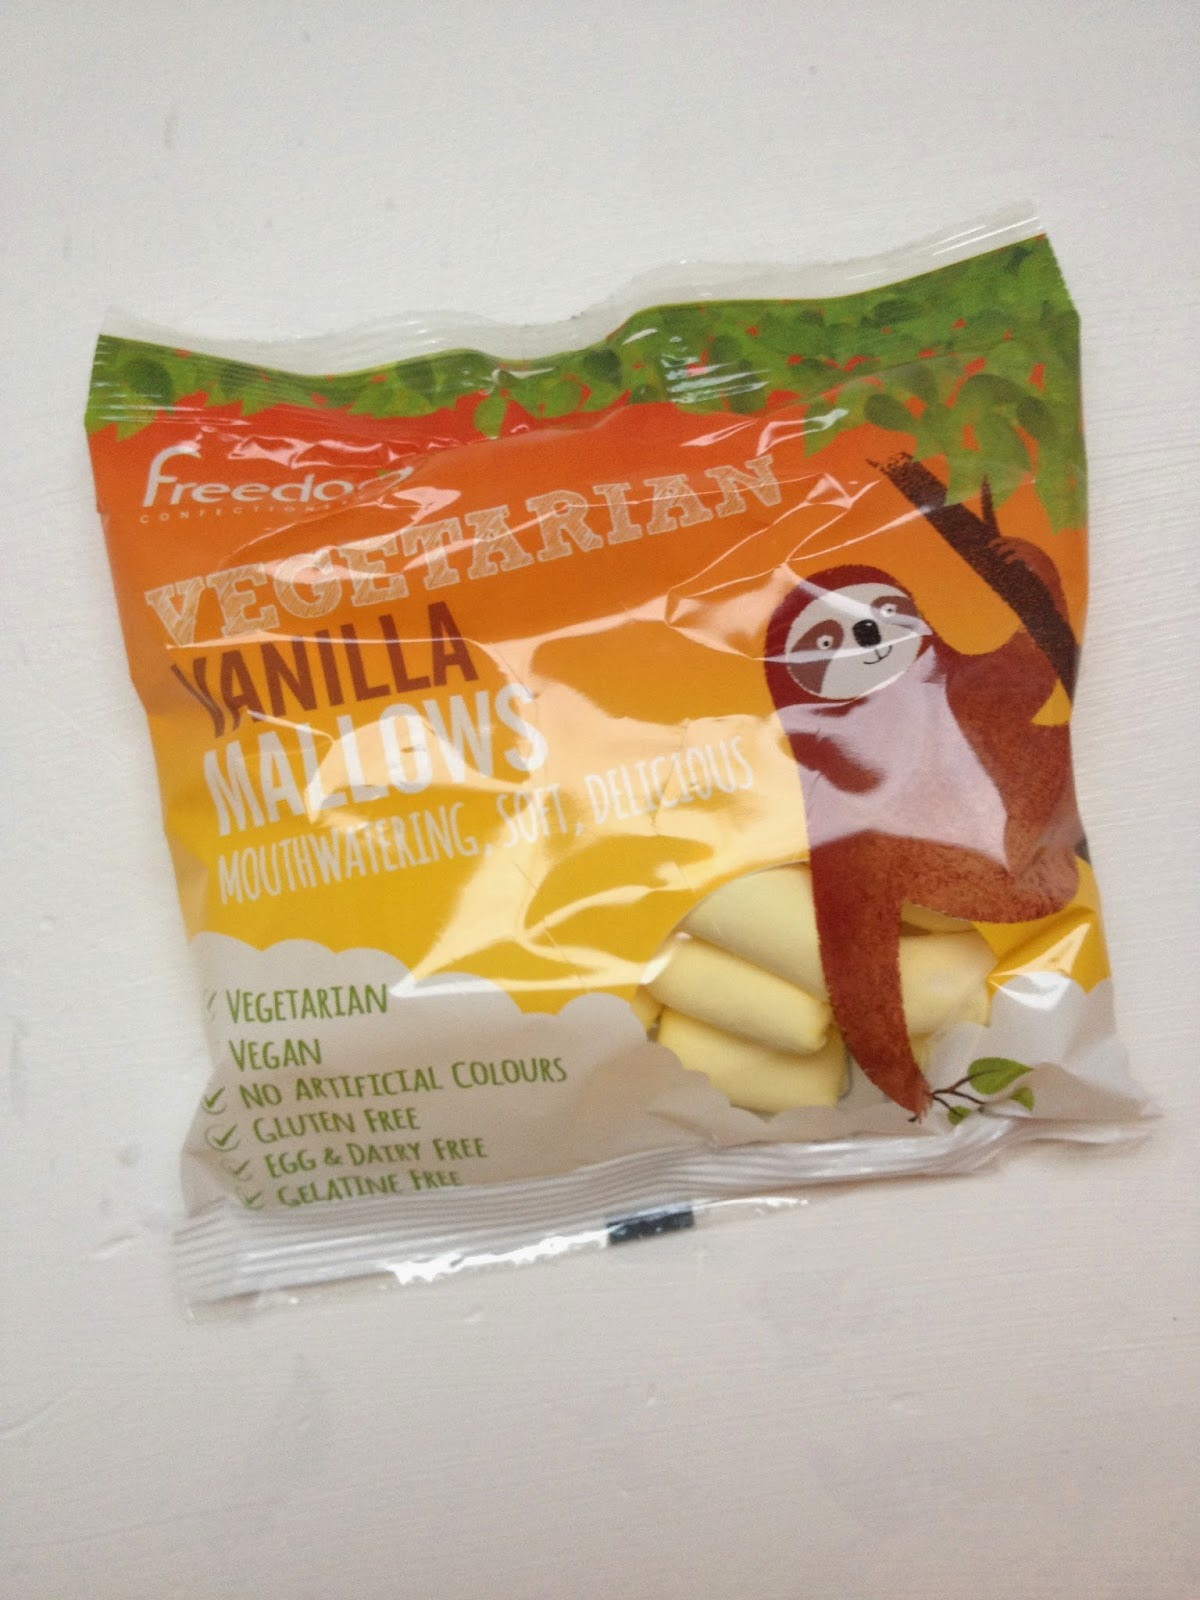 veganska marshmallows ica